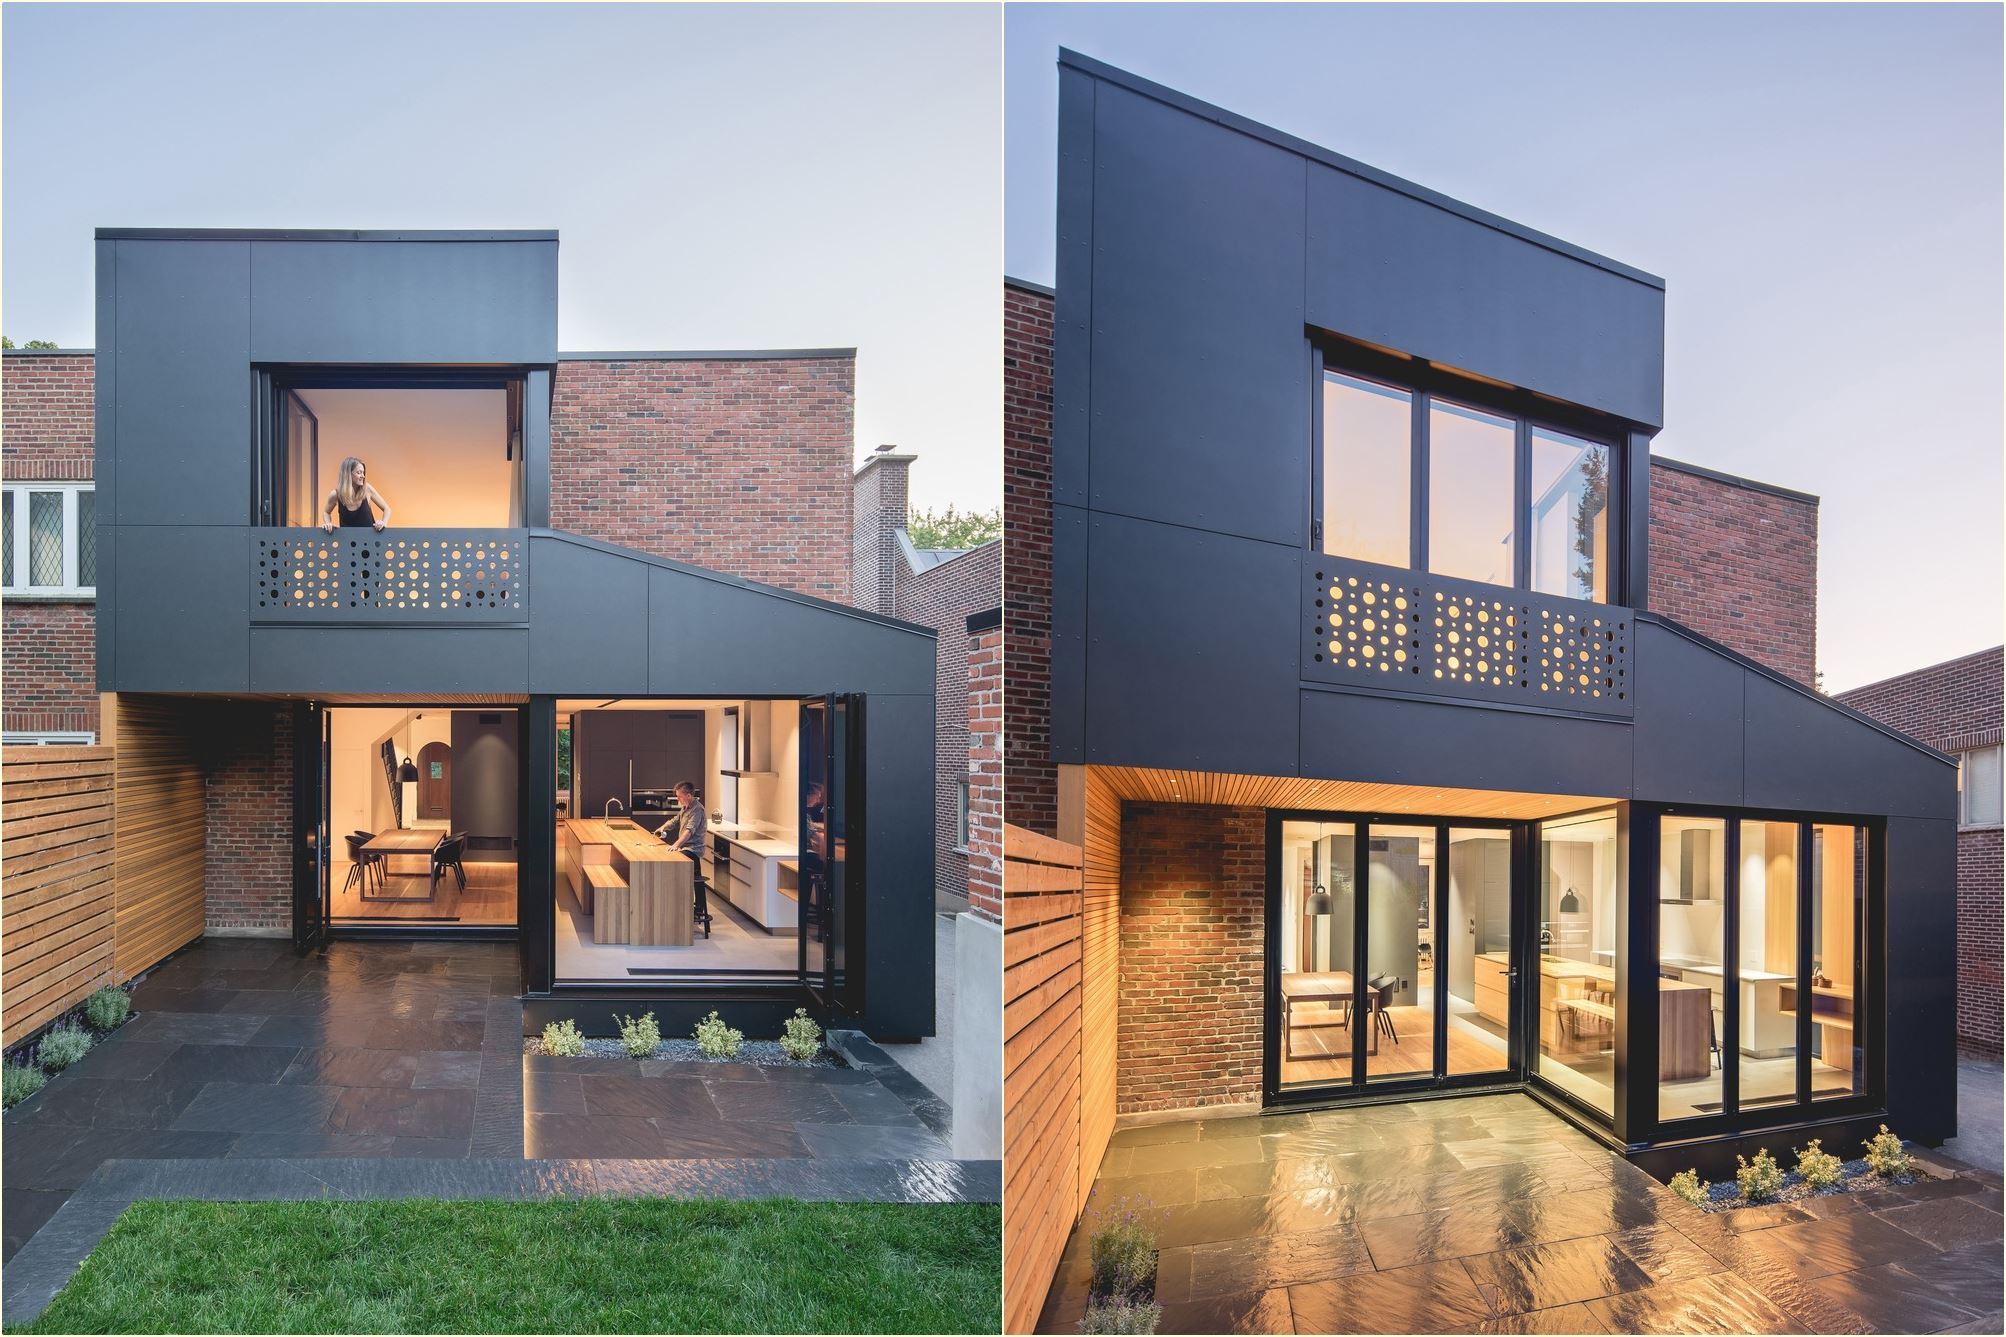 Tiny House Prix M2 black box iinatalie dionne architecture | building indonesia